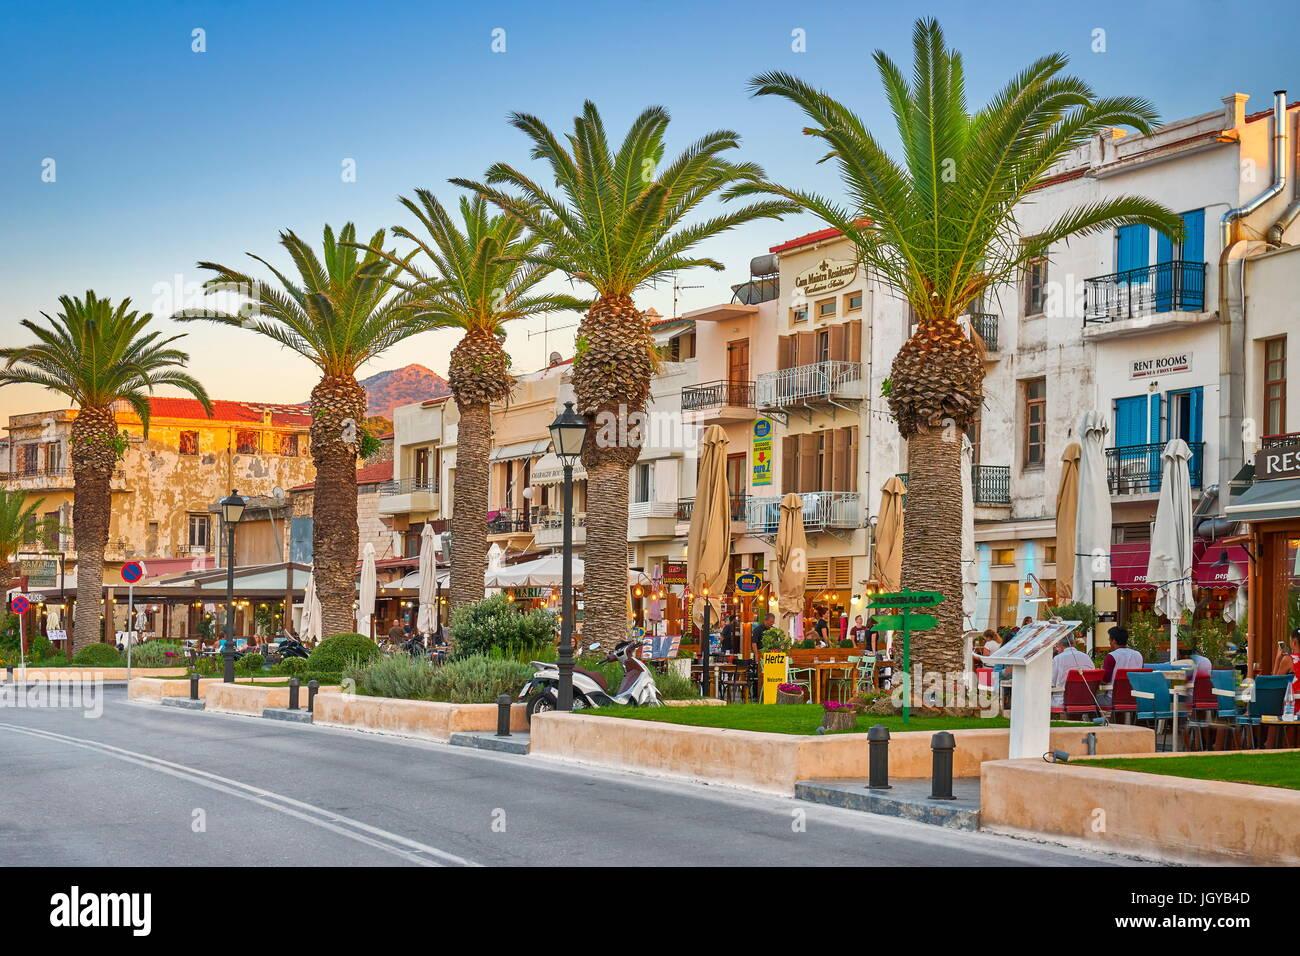 Vieille ville, promenade, Rethymno, Crète, Grèce Photo Stock